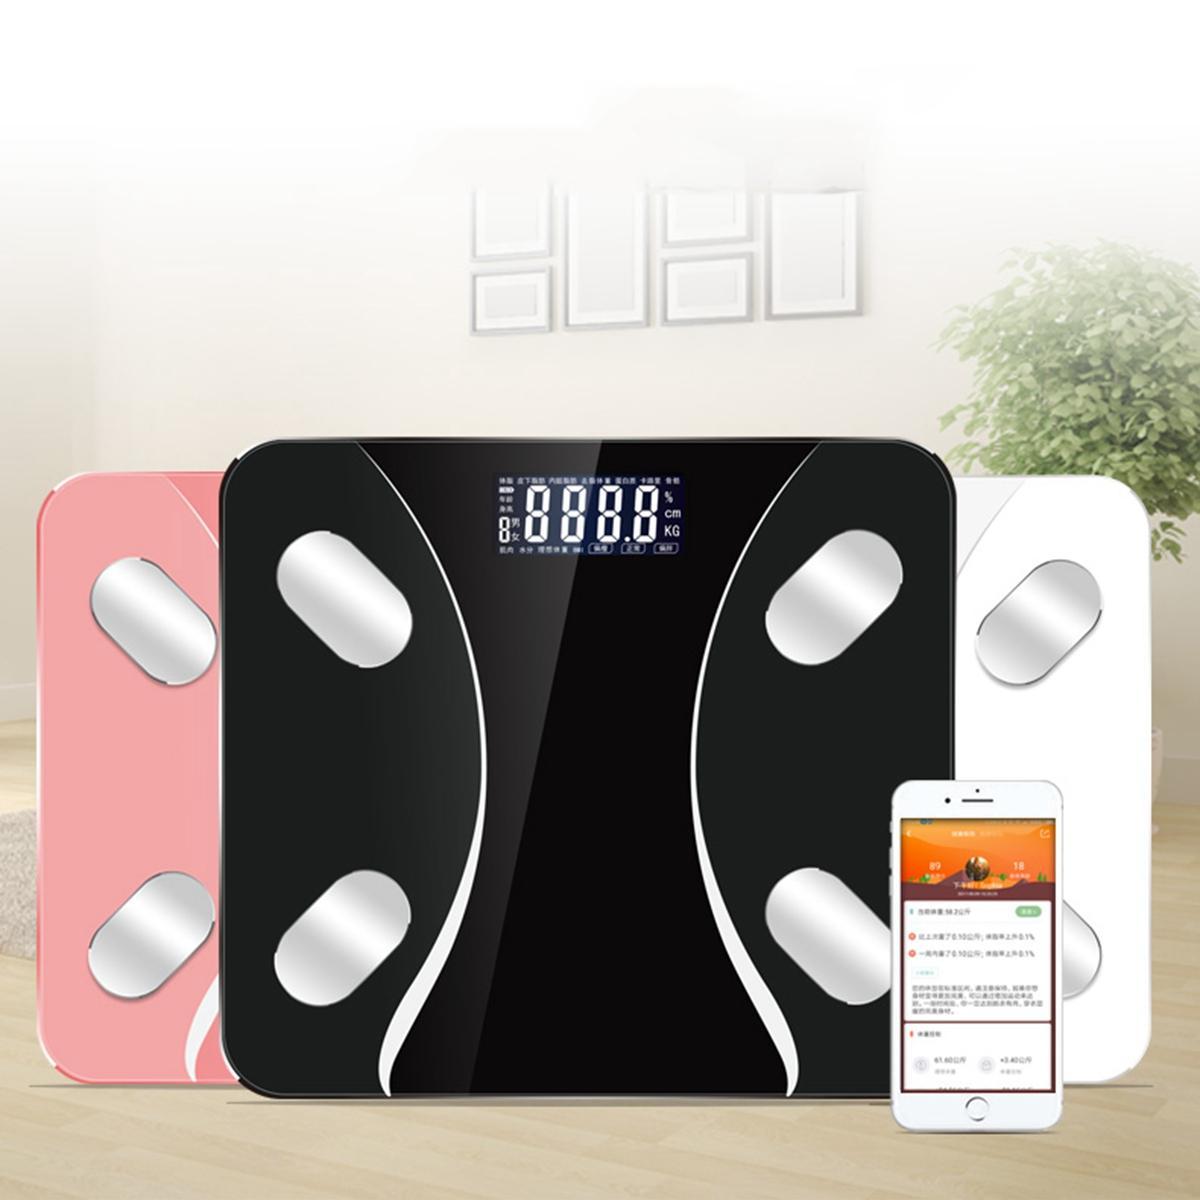 KCASA Smart Body Fat Scale Measure Human Body Composition